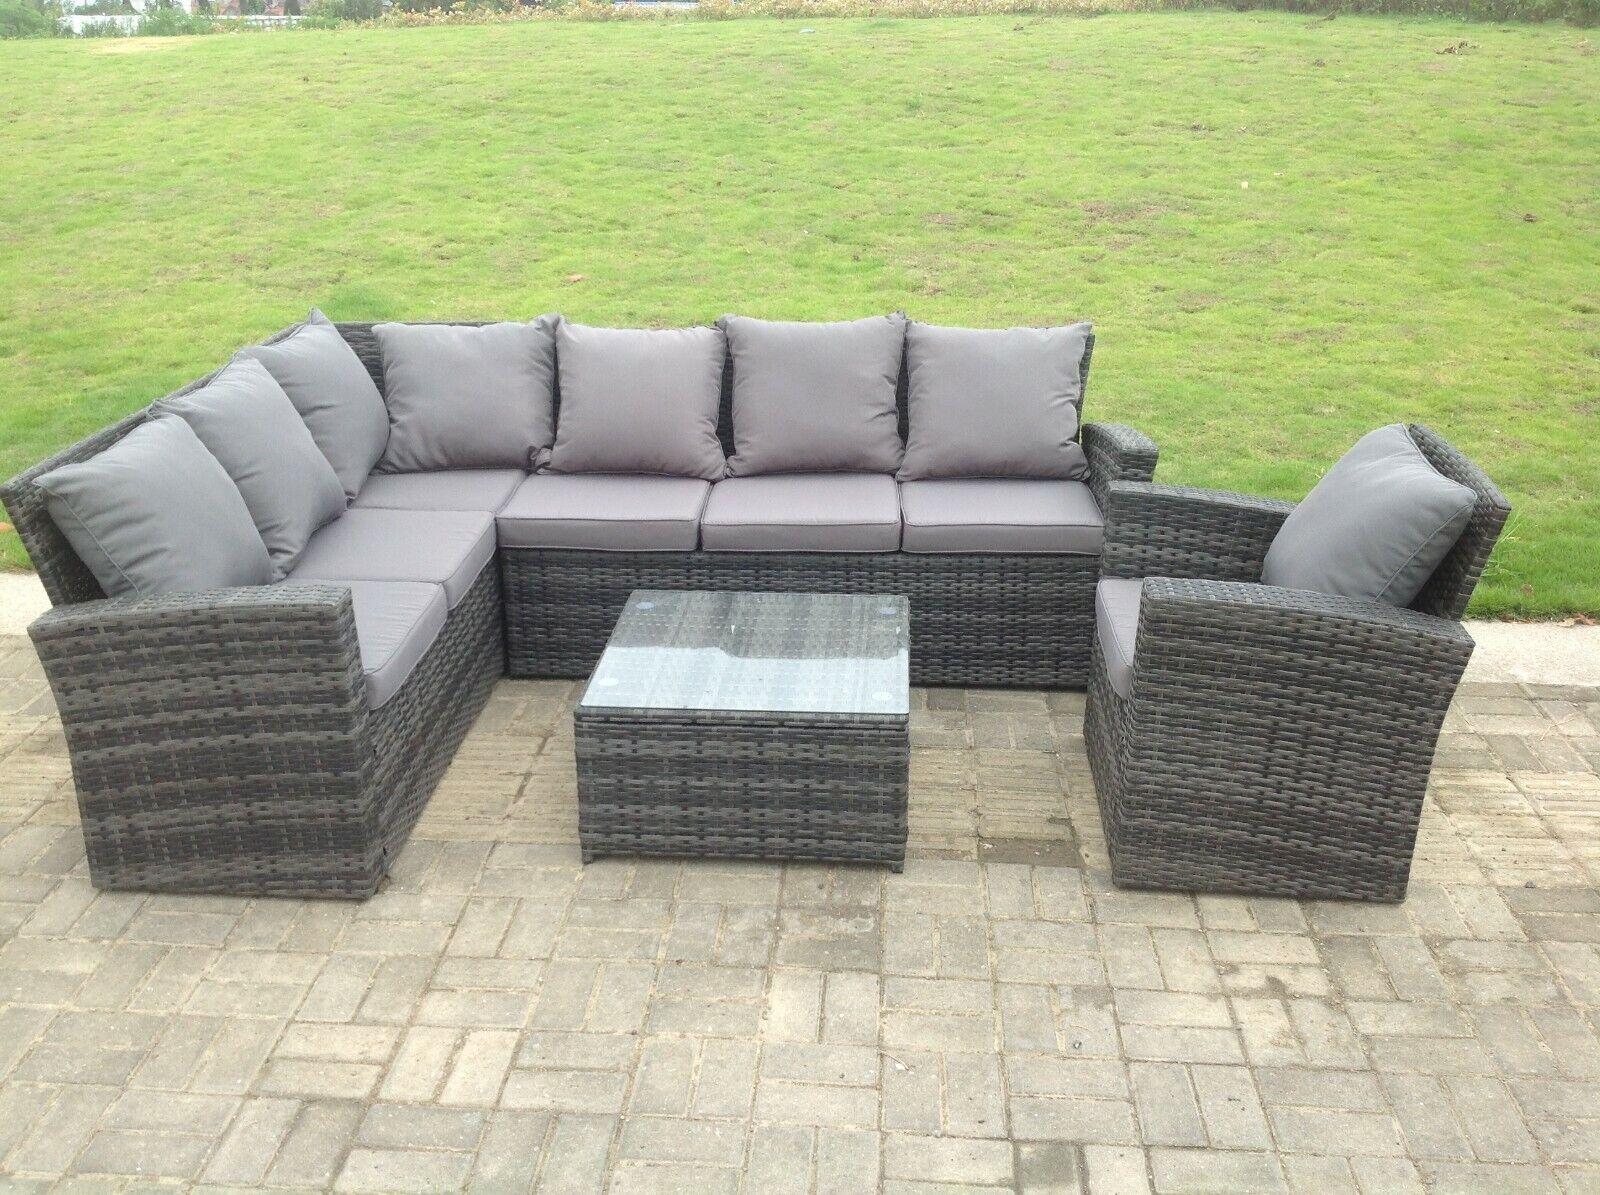 Garden Furniture - Grey Wicker Rattan Garden Furniture Sets Corner Sofa Outdoor Patio Coffee Table